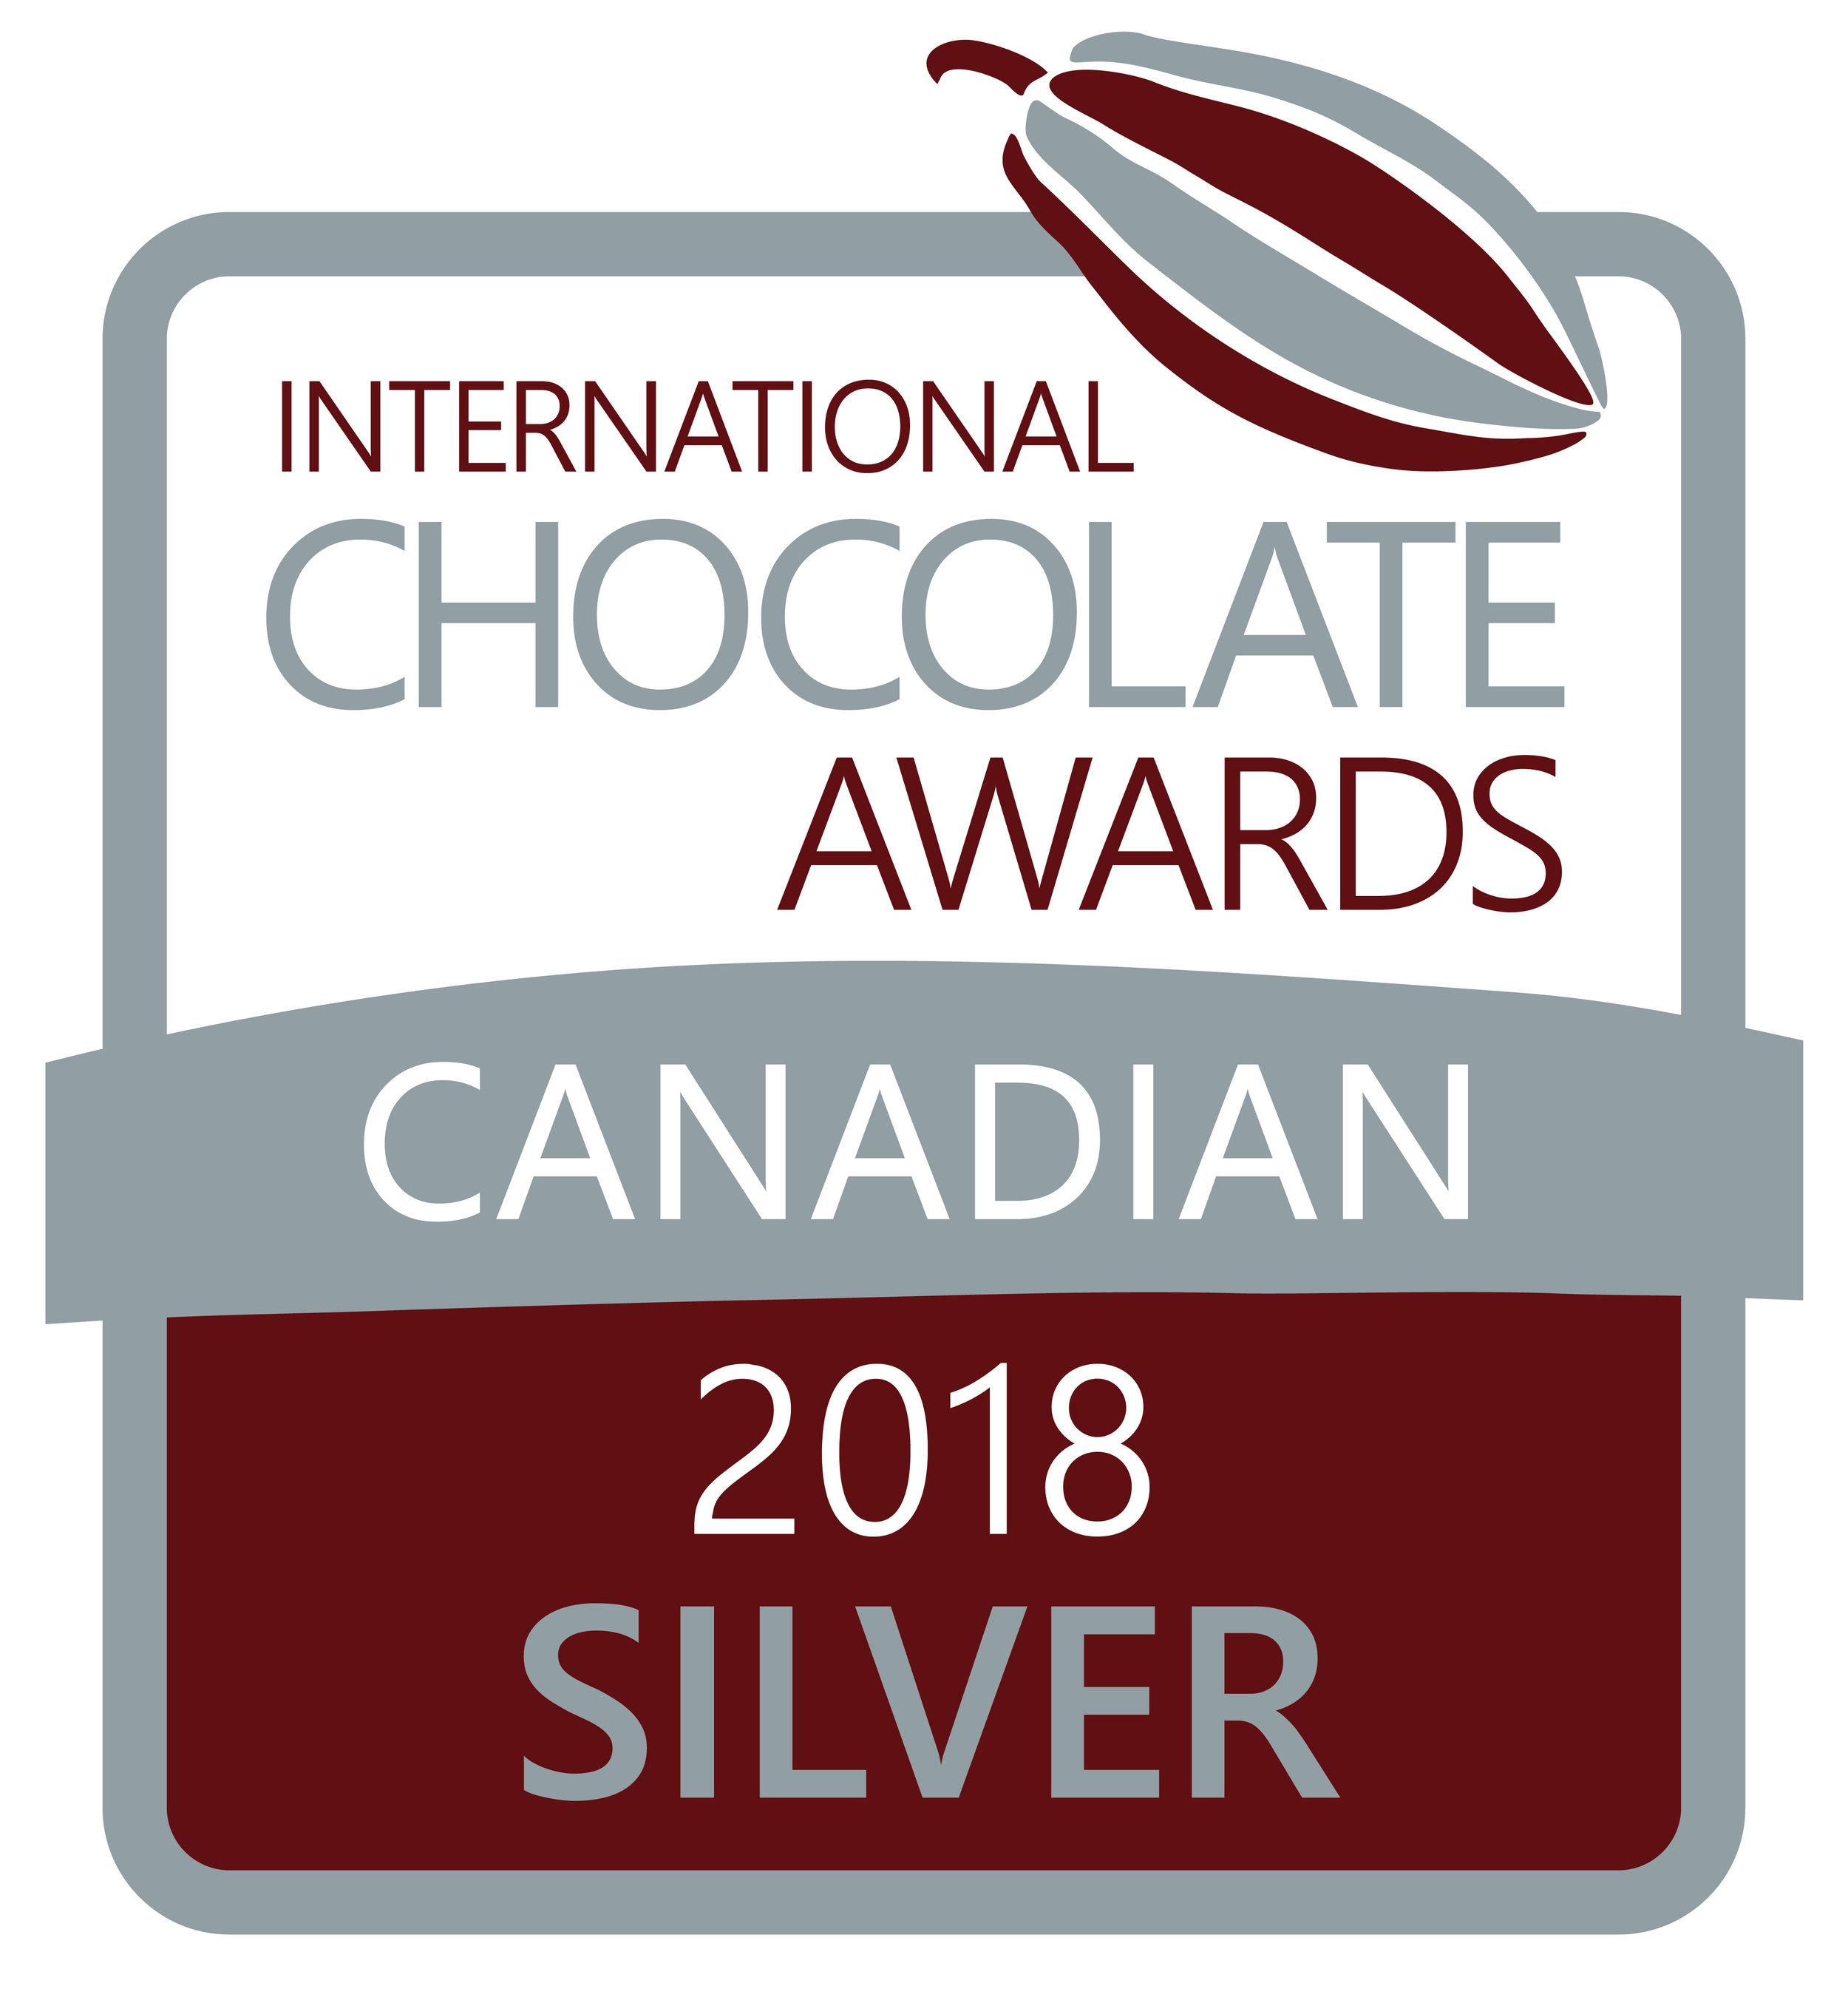 ica-prize-logo-2018-silver-canadian-rgb.jpg